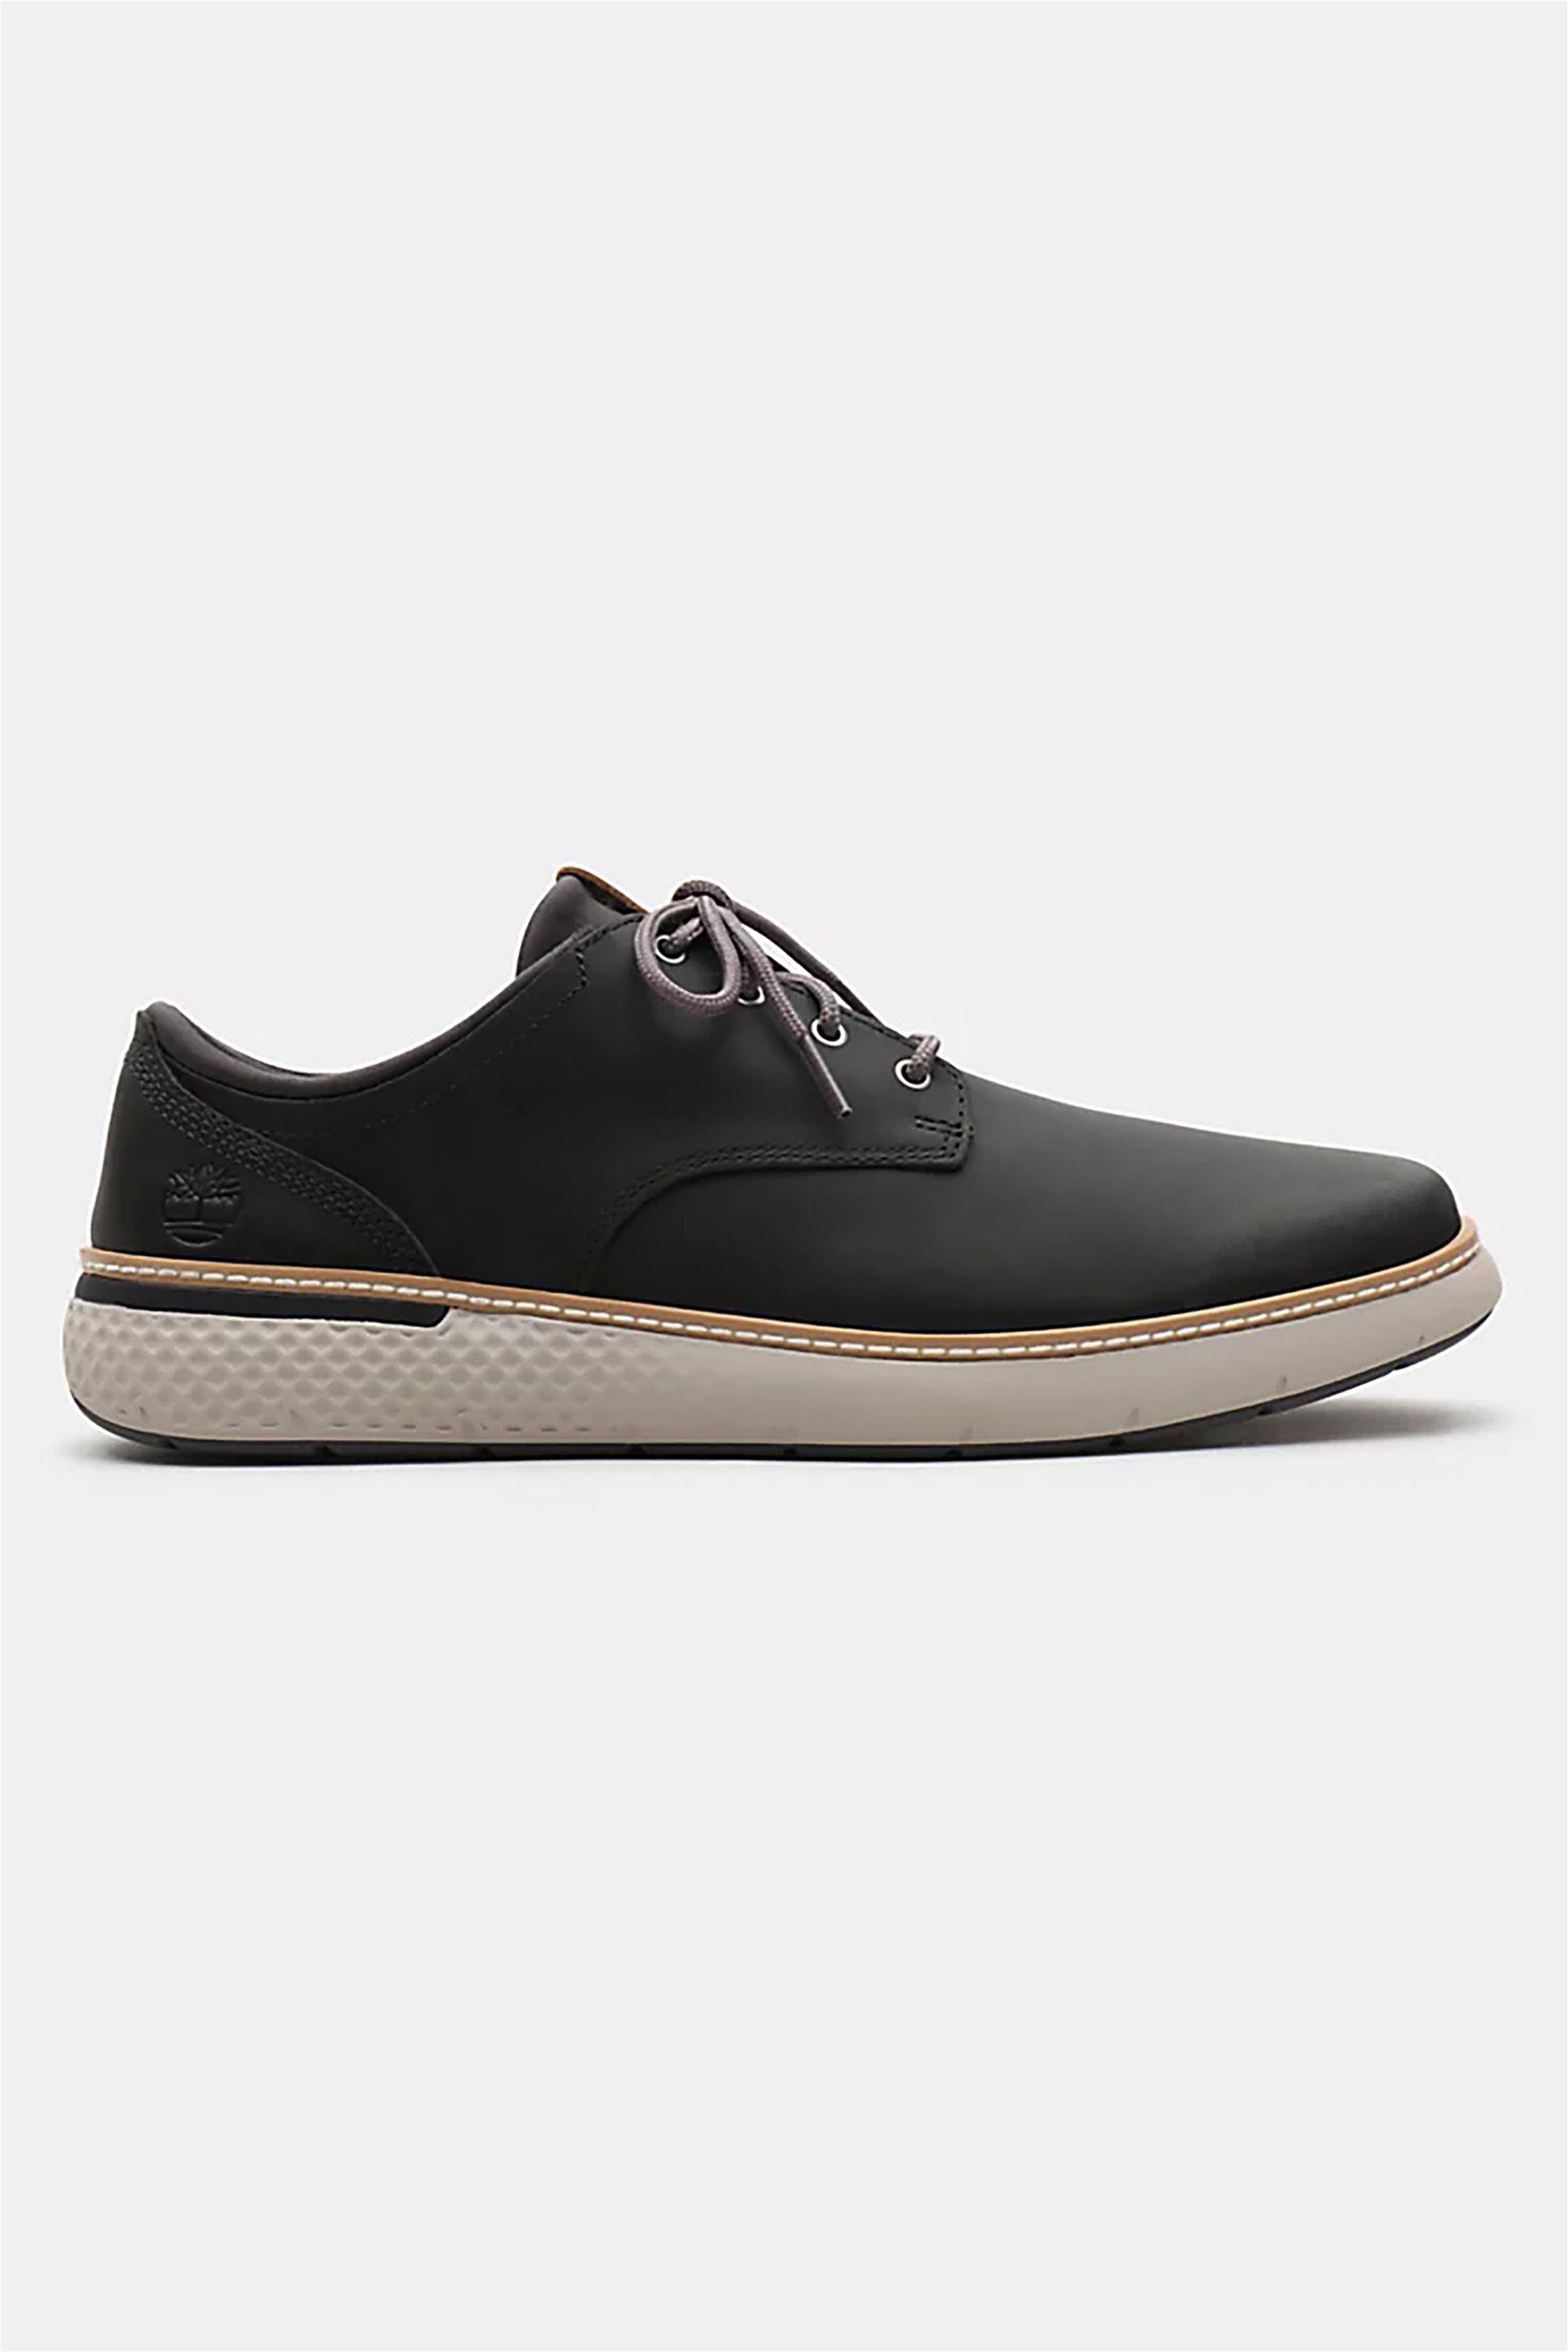 Timberland ανδρικά παπούτσια Cross Mark Oxford – TB0A1SQPP011 – Λαδί